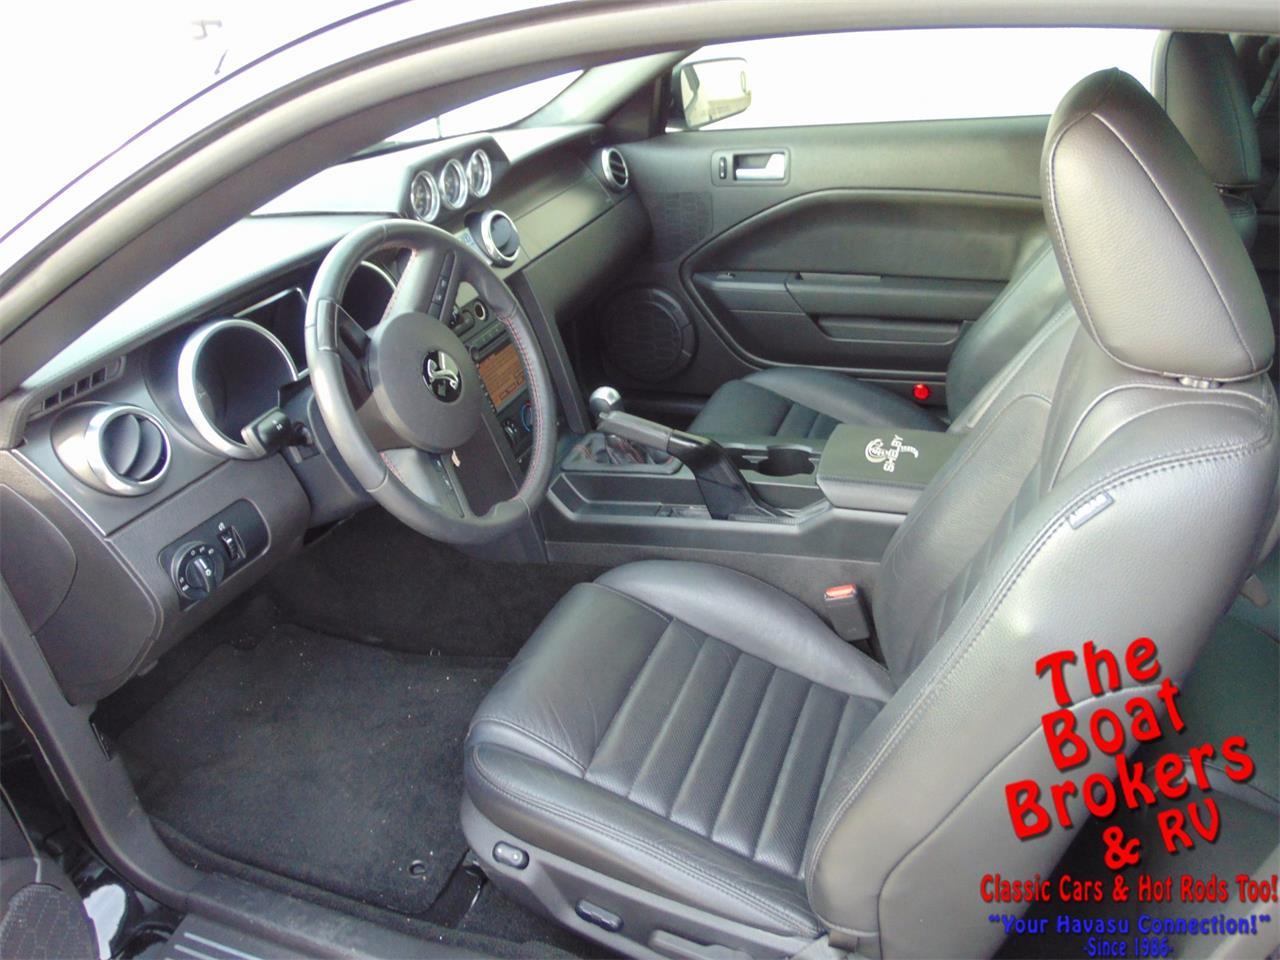 Miraculous 2007 Shelby Mustang For Sale In Lake Havasu Az Beatyapartments Chair Design Images Beatyapartmentscom